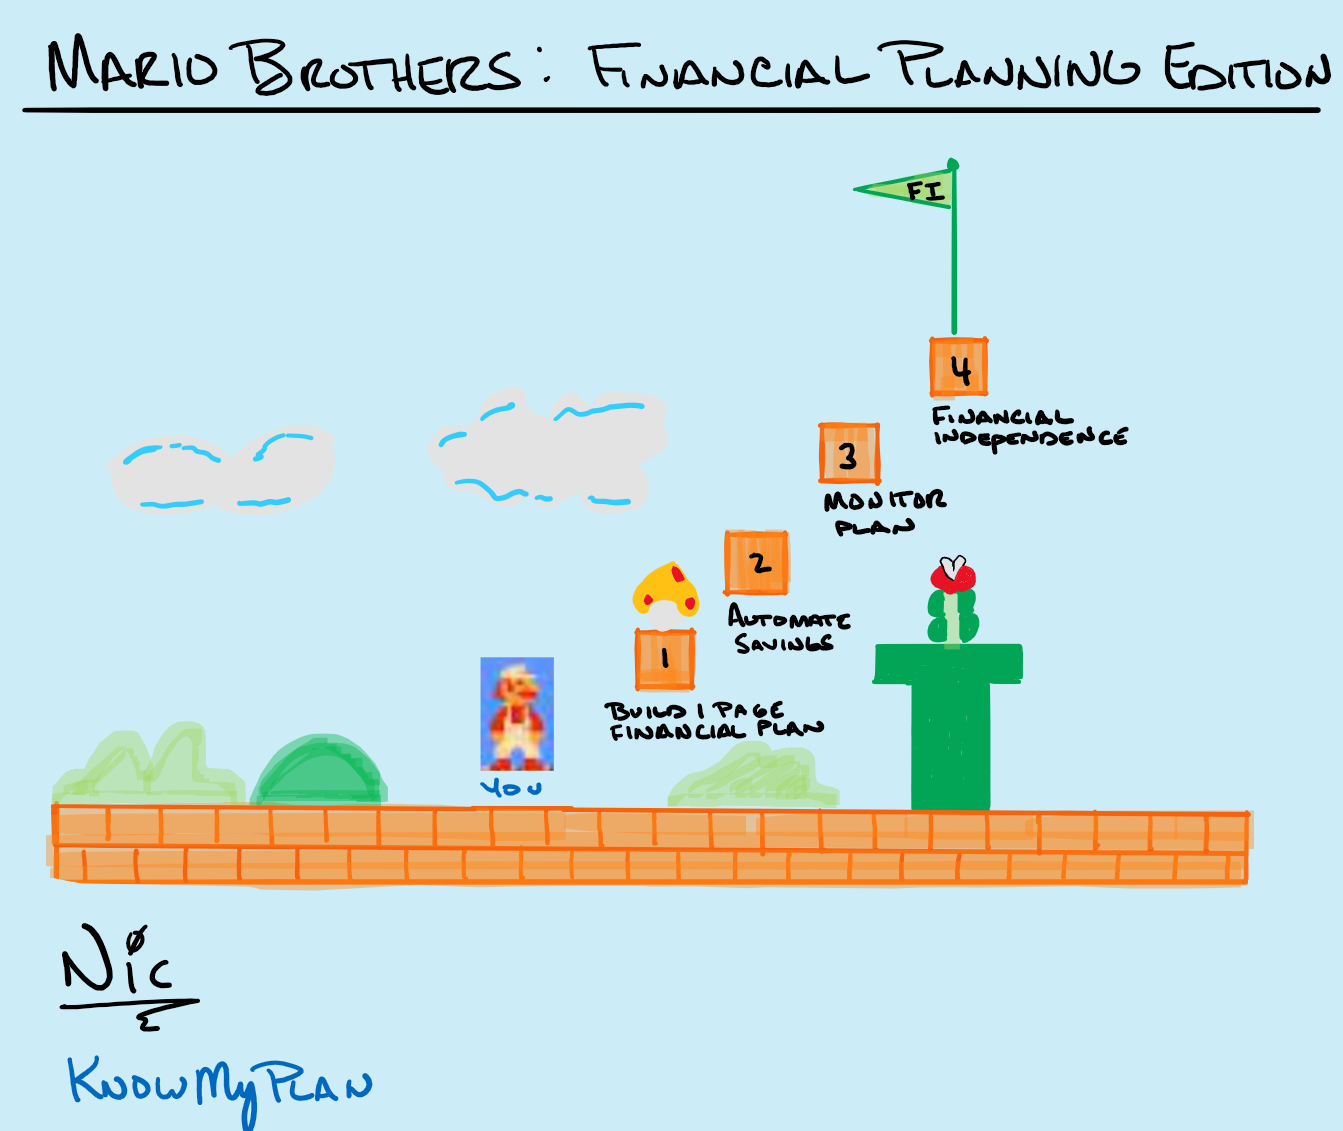 Mario Brothers: Financial Planning Edition Thumbnail